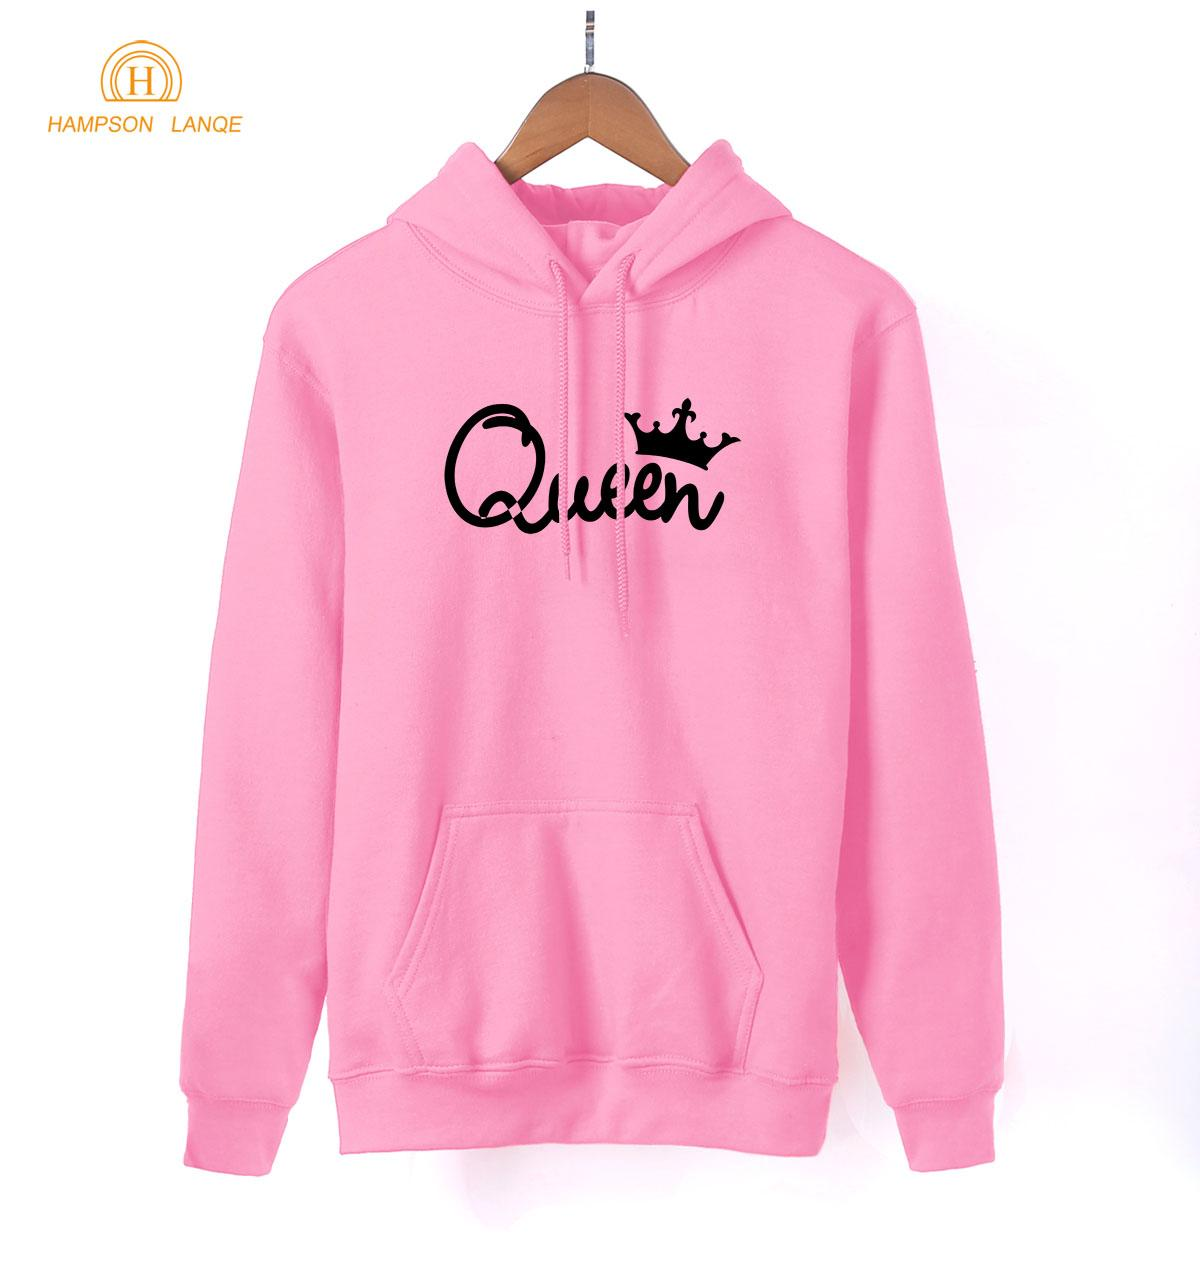 Imperial Queen Drucken Weiblich Pullovers 2018 Hot Spring Netter Herbst Sweatshirts Frauen Slim Fit Pullover Rosa Harajuku Hoody